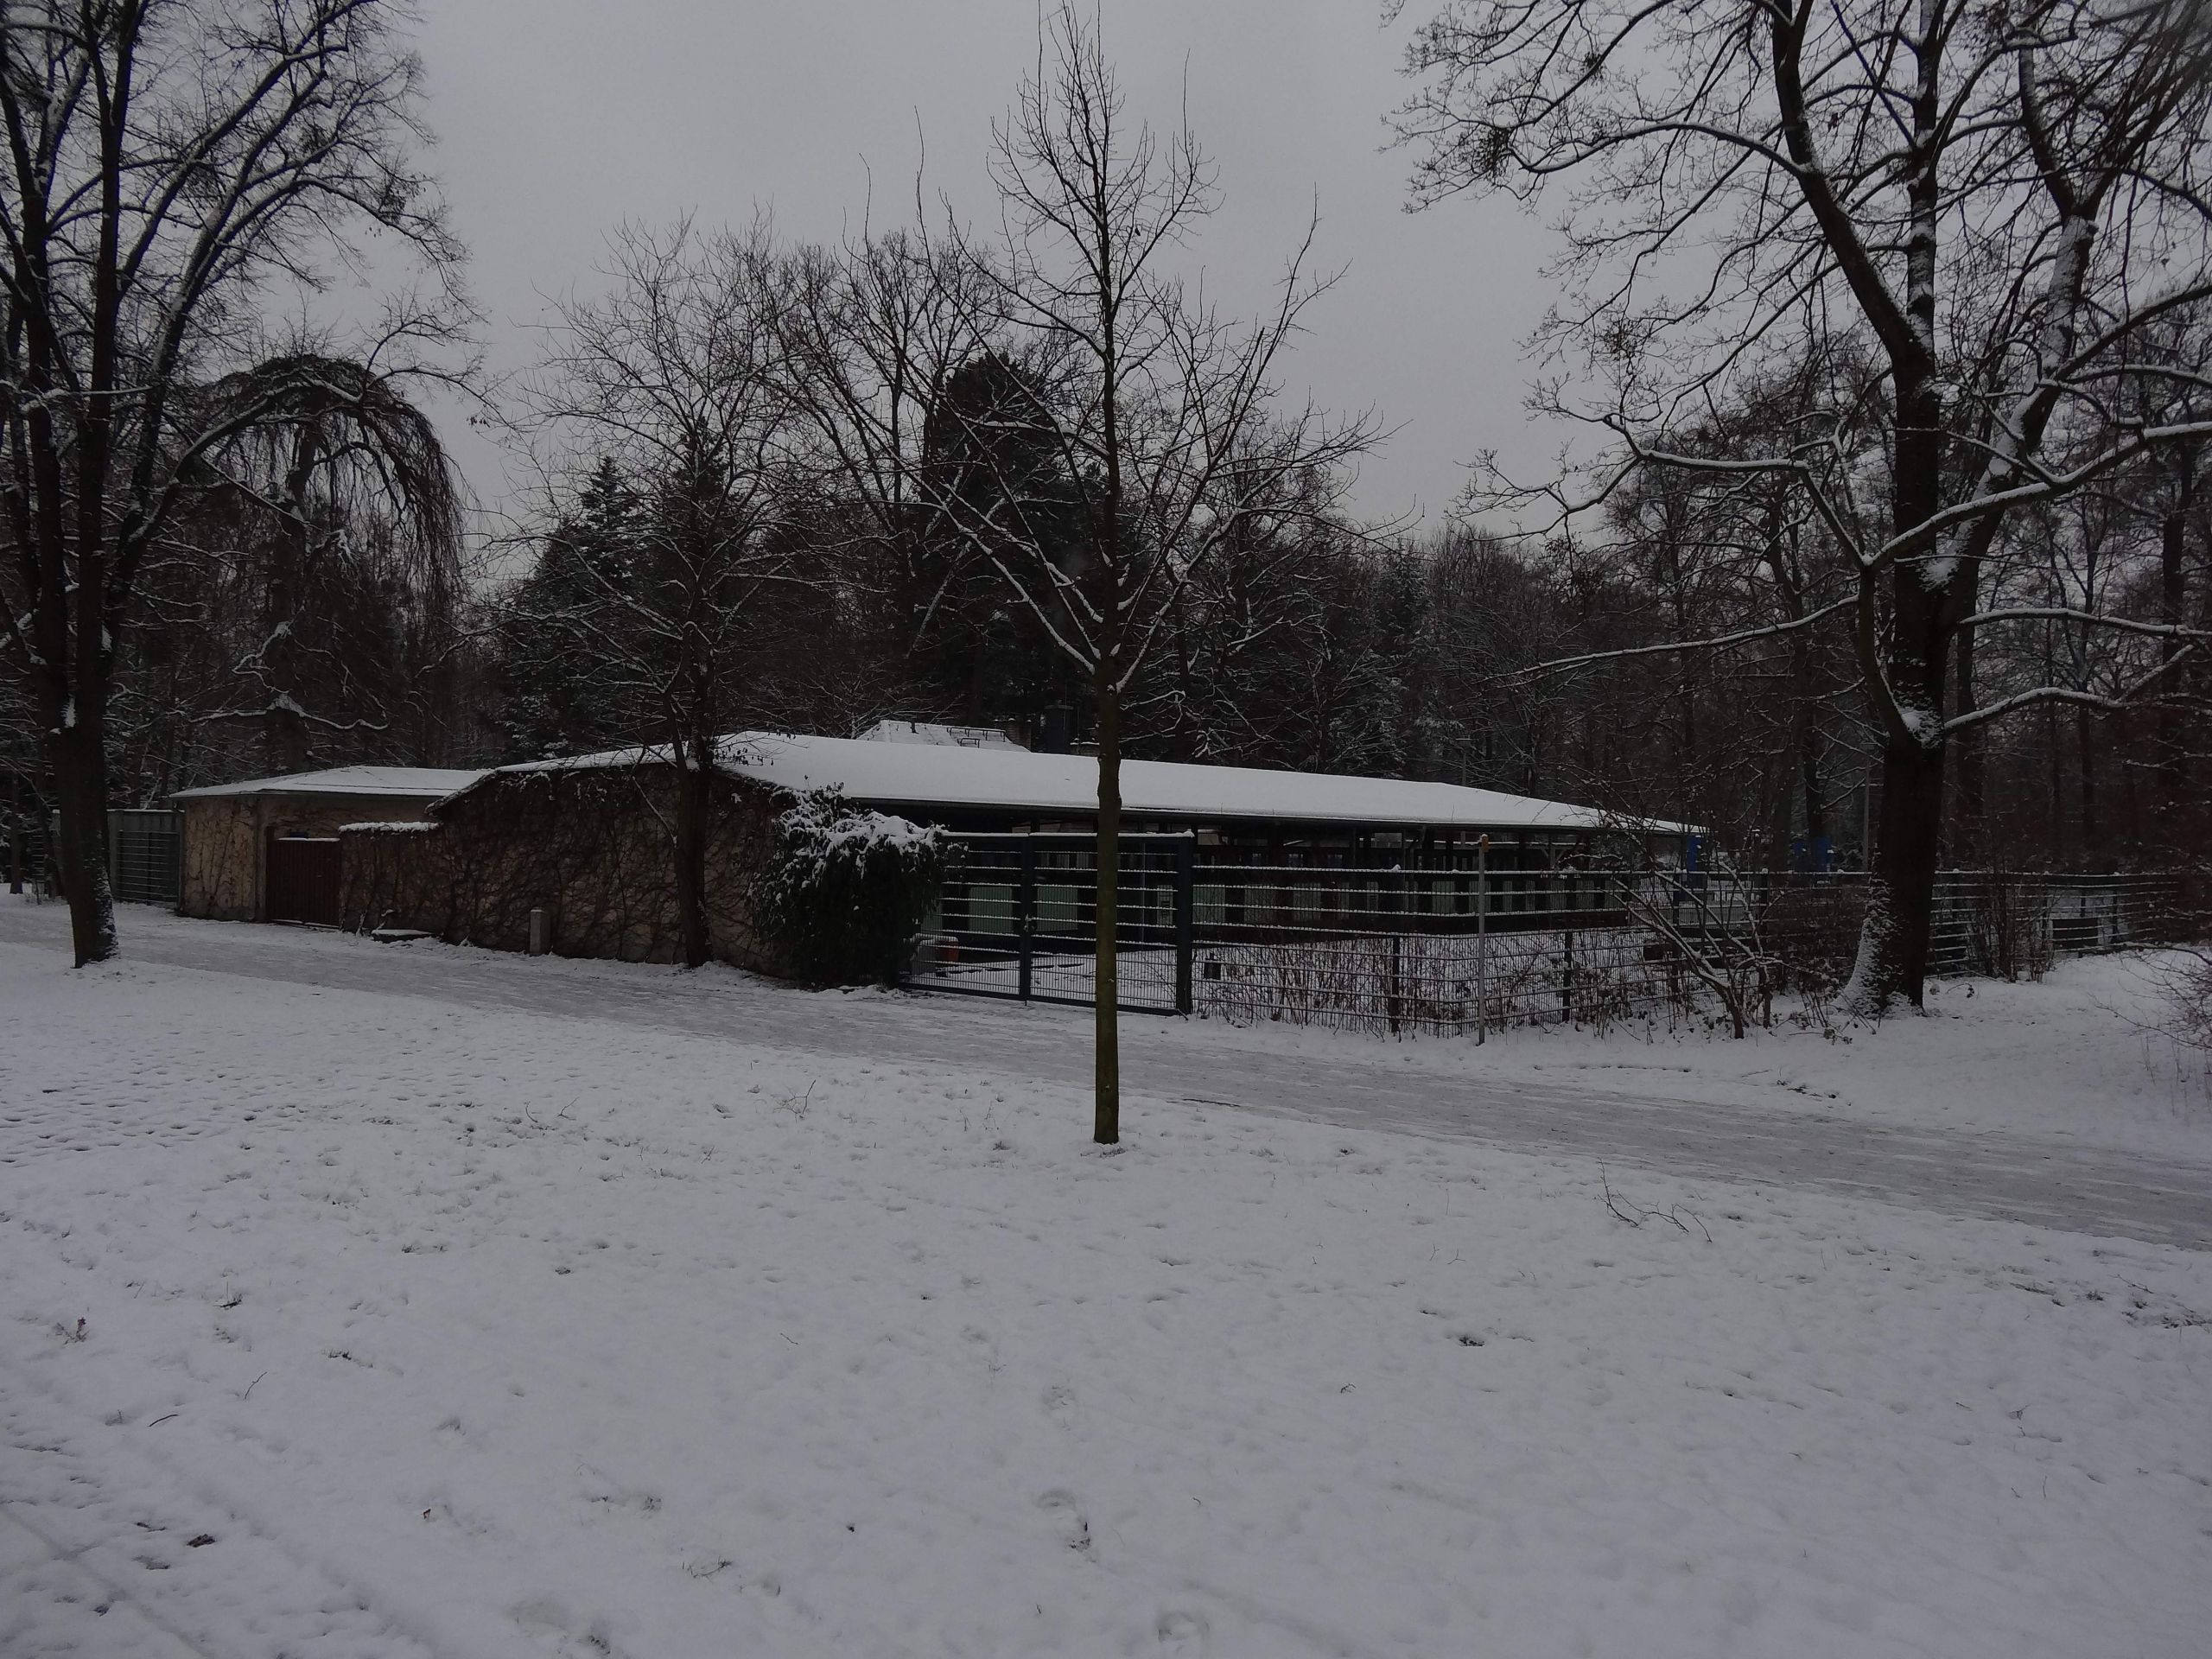 Dresdner Parkeisenbahn Depot am Bahnhof Zoo %